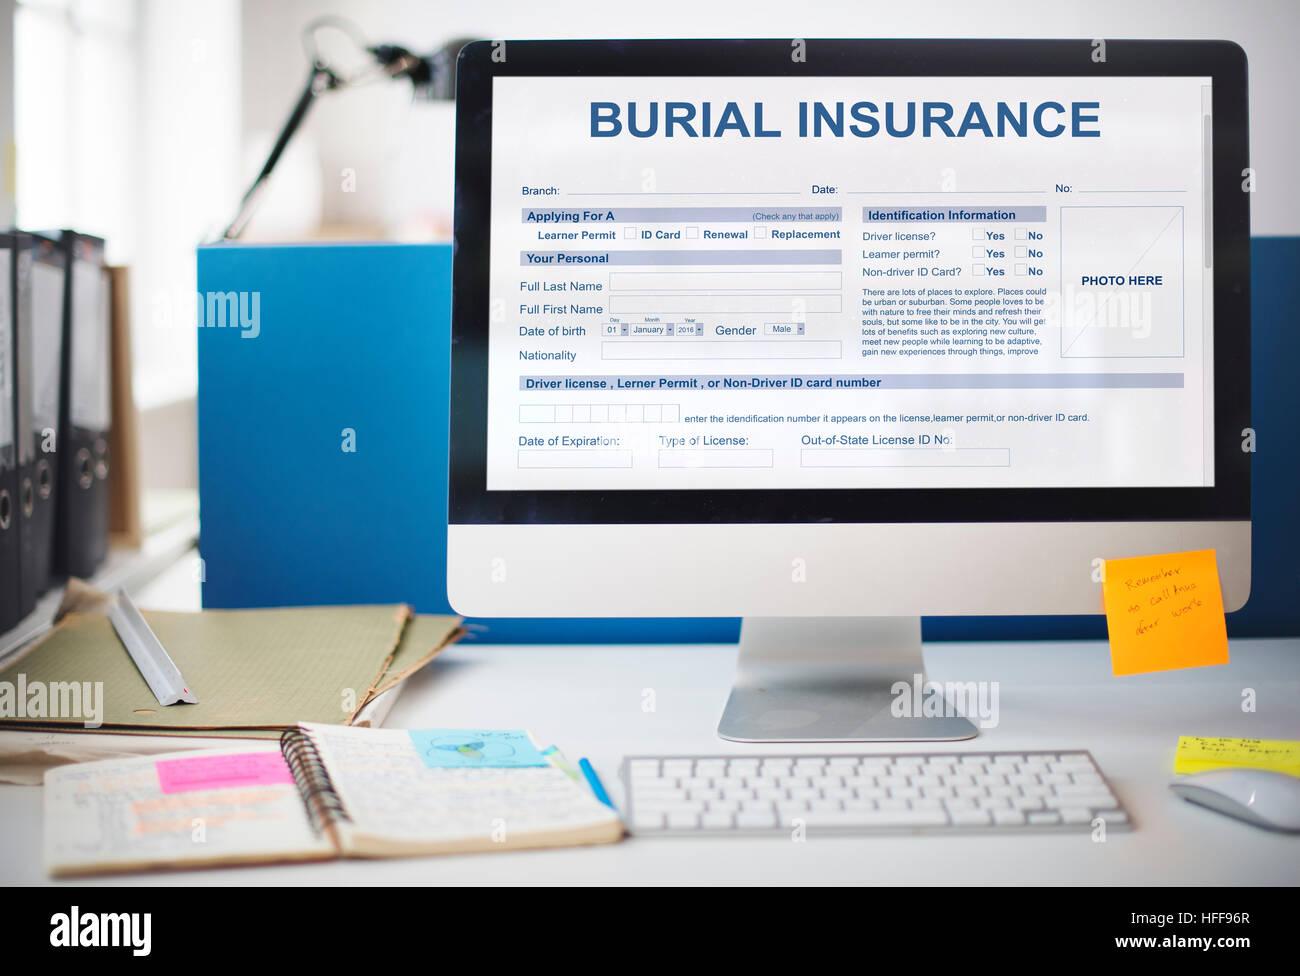 Burial Equipment Stock Photos & Burial Equipment Stock